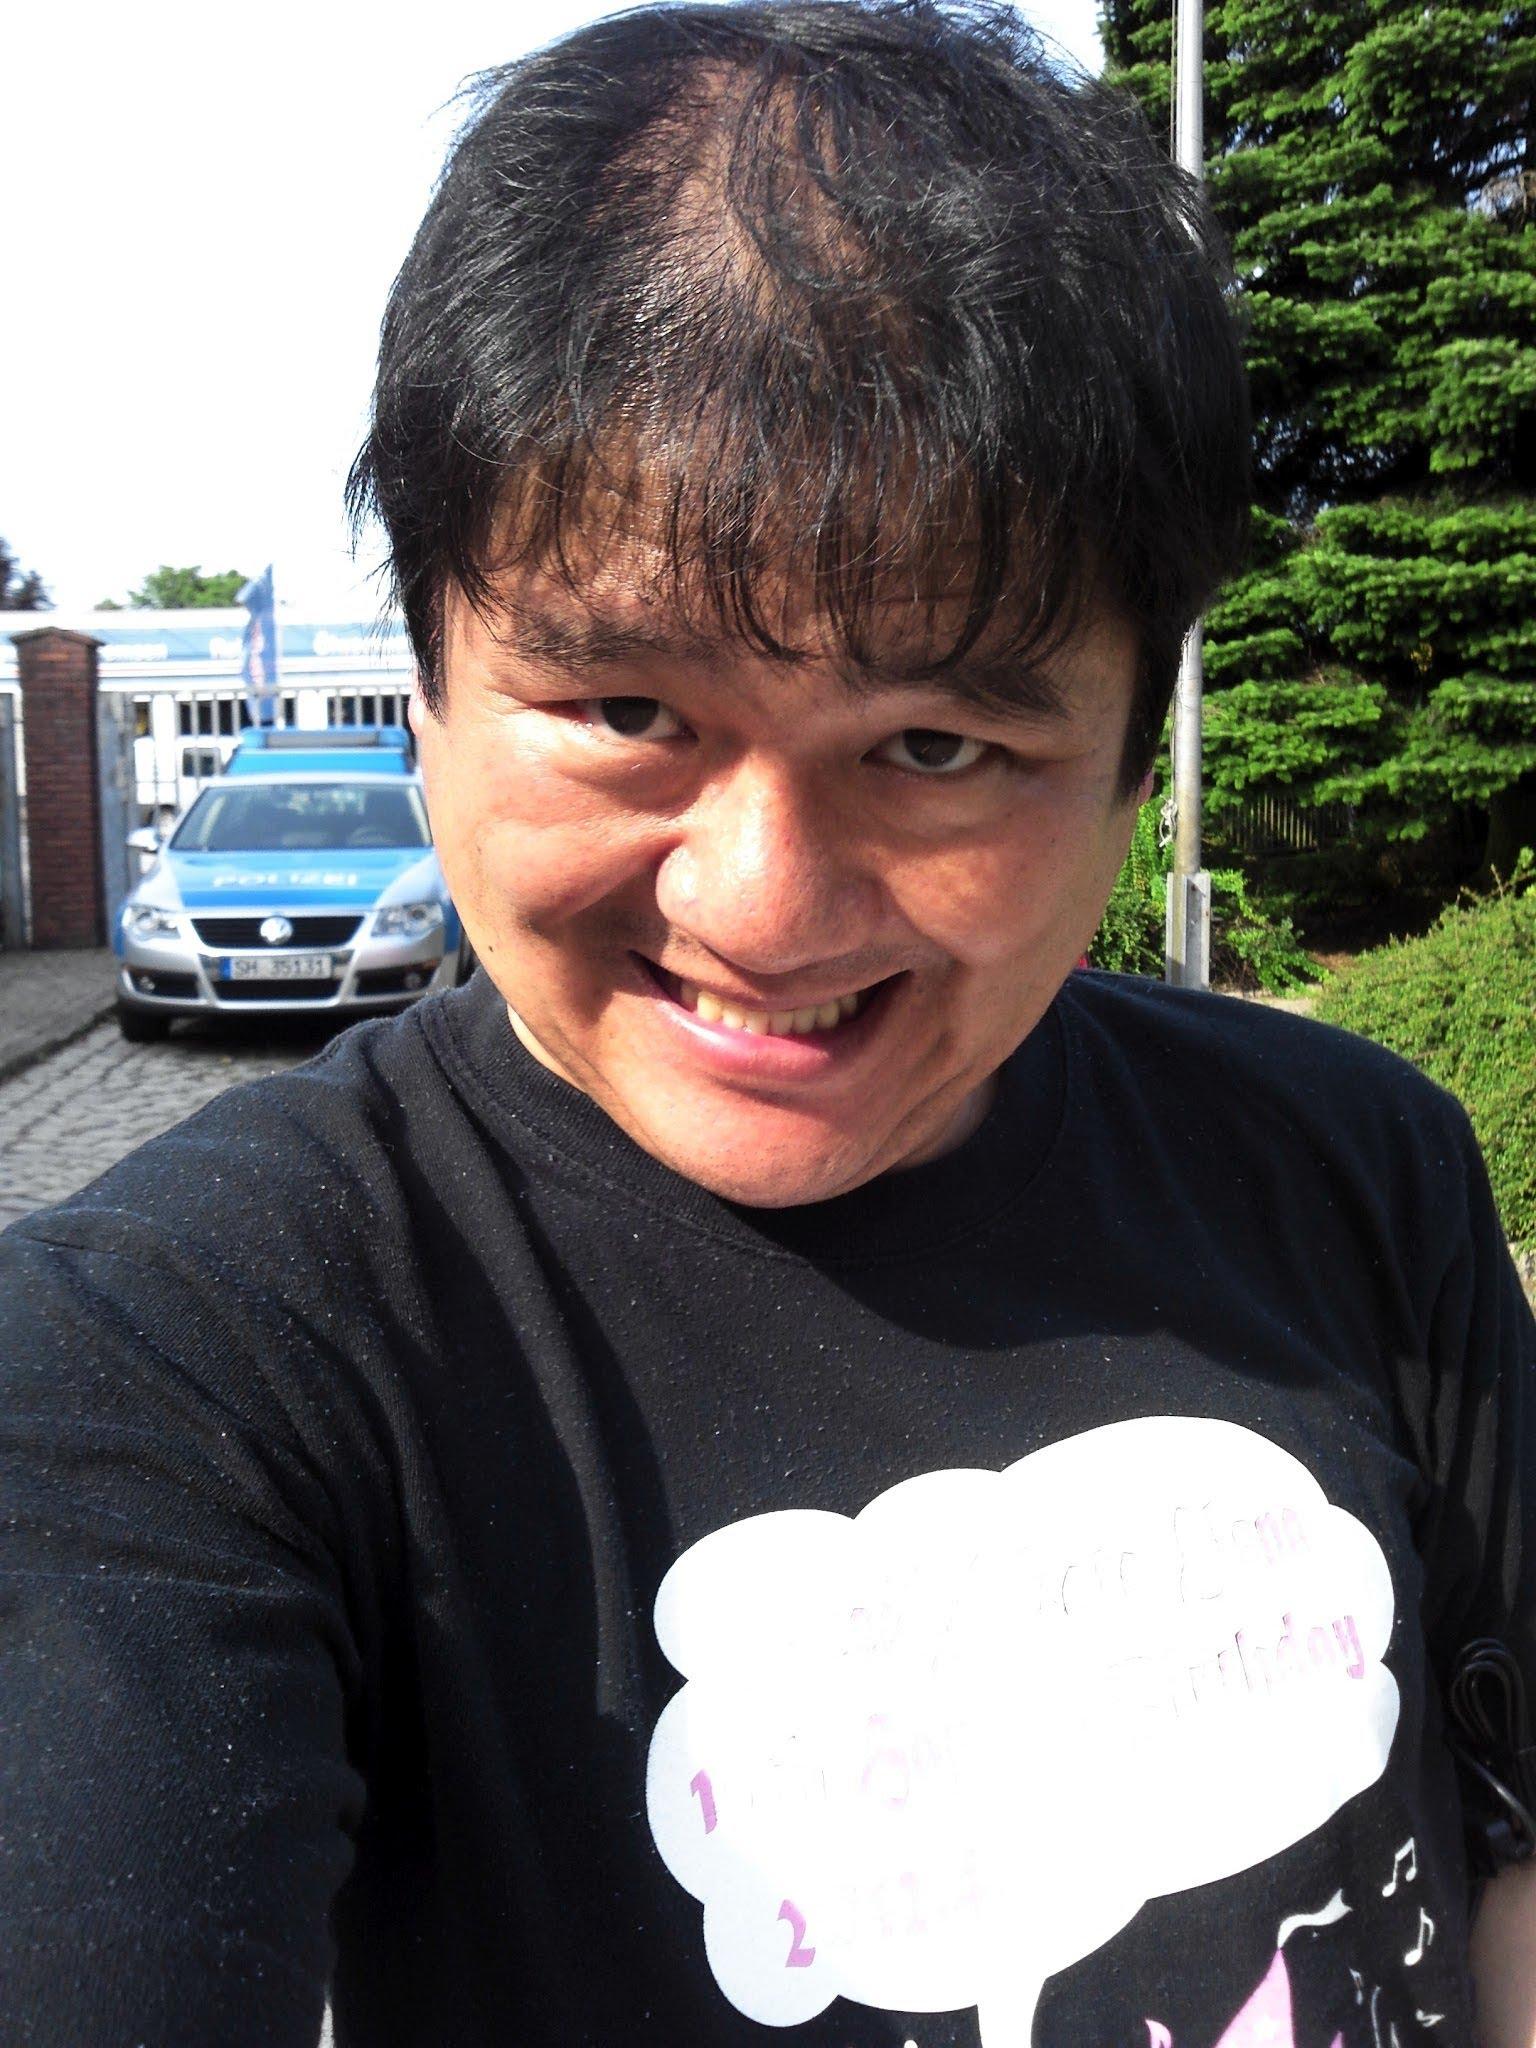 【AKB握手会切りつけ事件】犯人はファンの「梅田悟」24歳(無職)